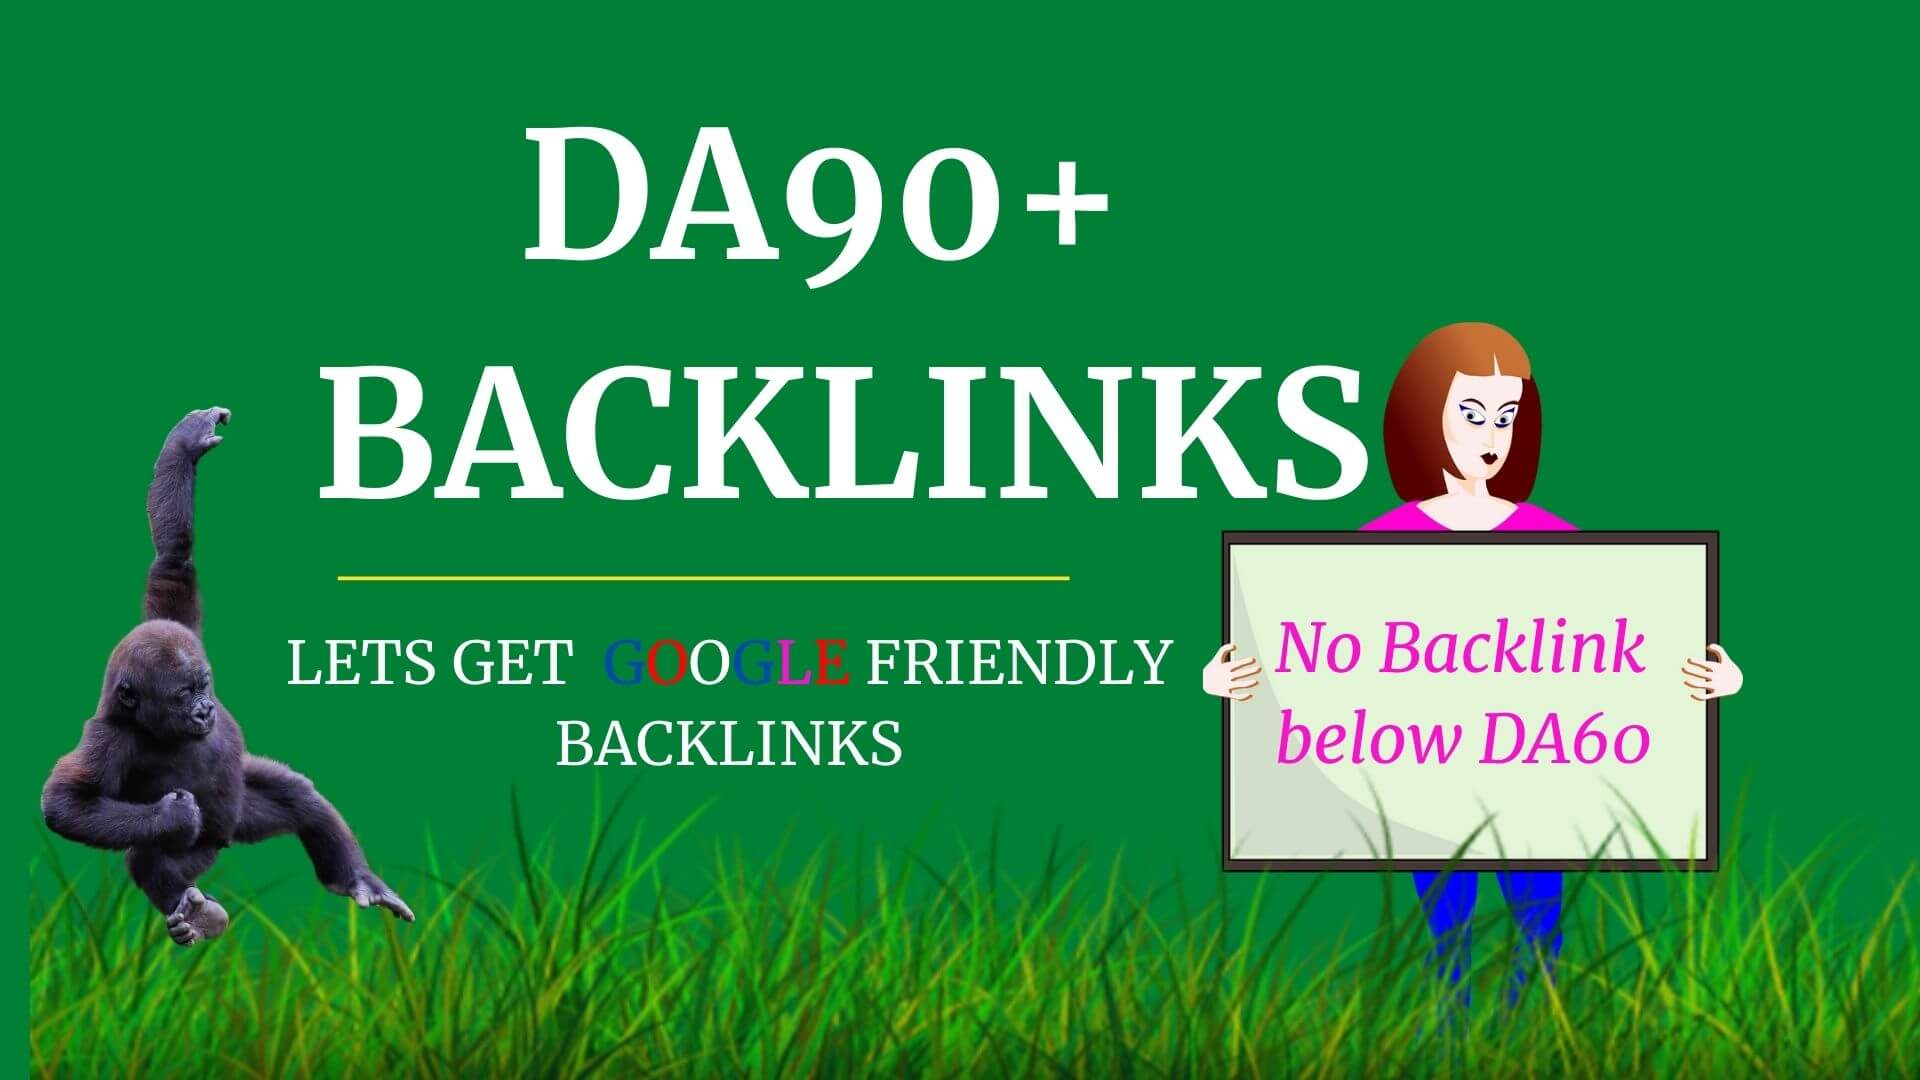 Only DA100 to DA60+ Backlinks from PDF,  Gov,  Wiki,  Edu,  Forum to rank high competition keyword